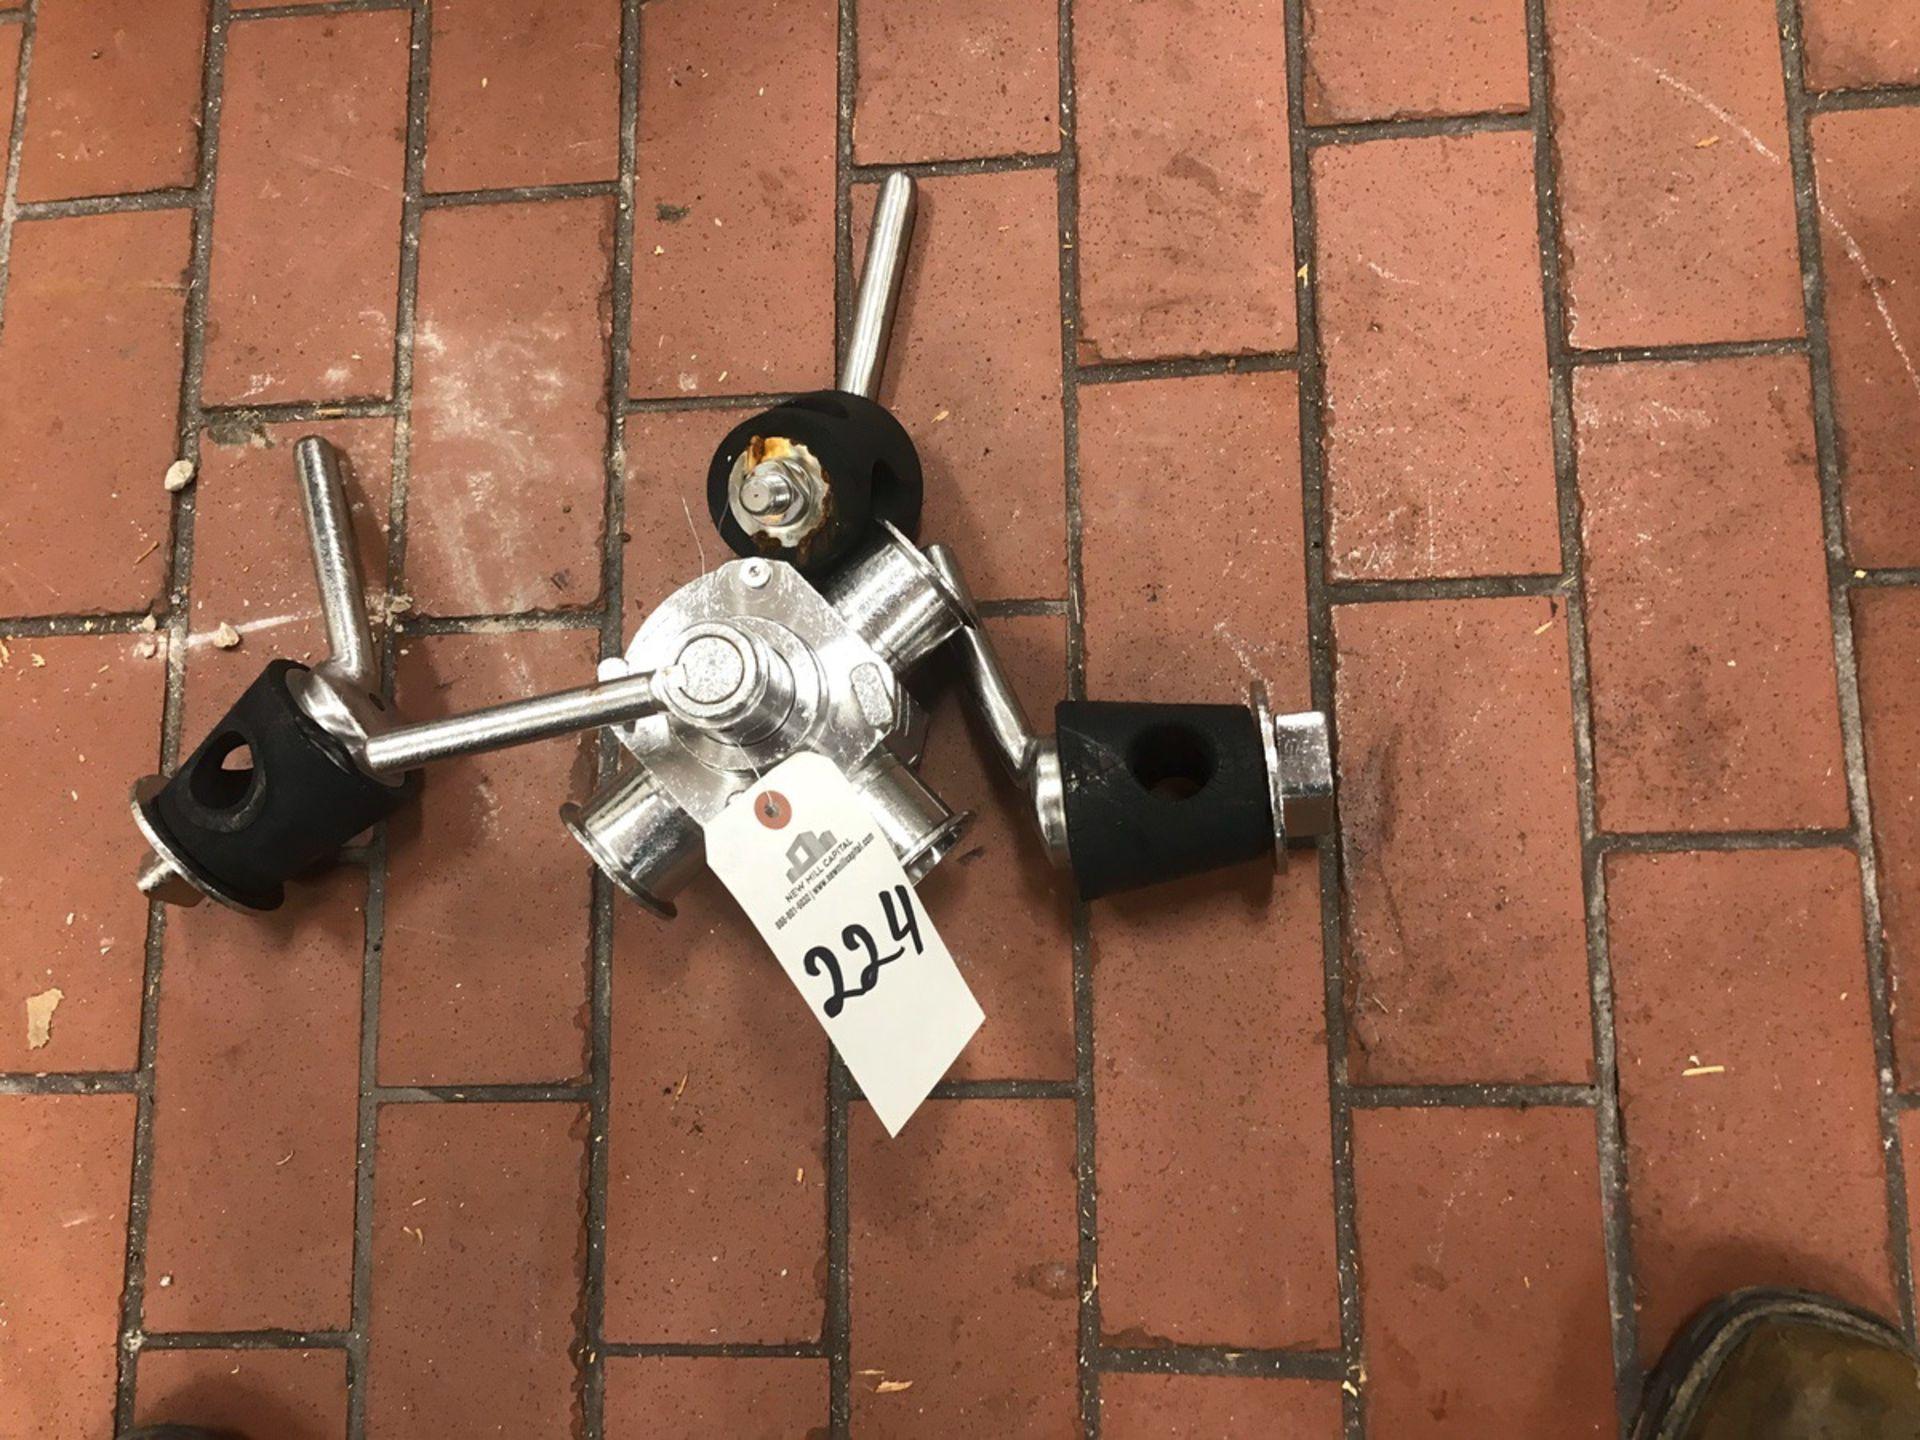 Lot 224 - Plug Valves | Rig Fee: $20